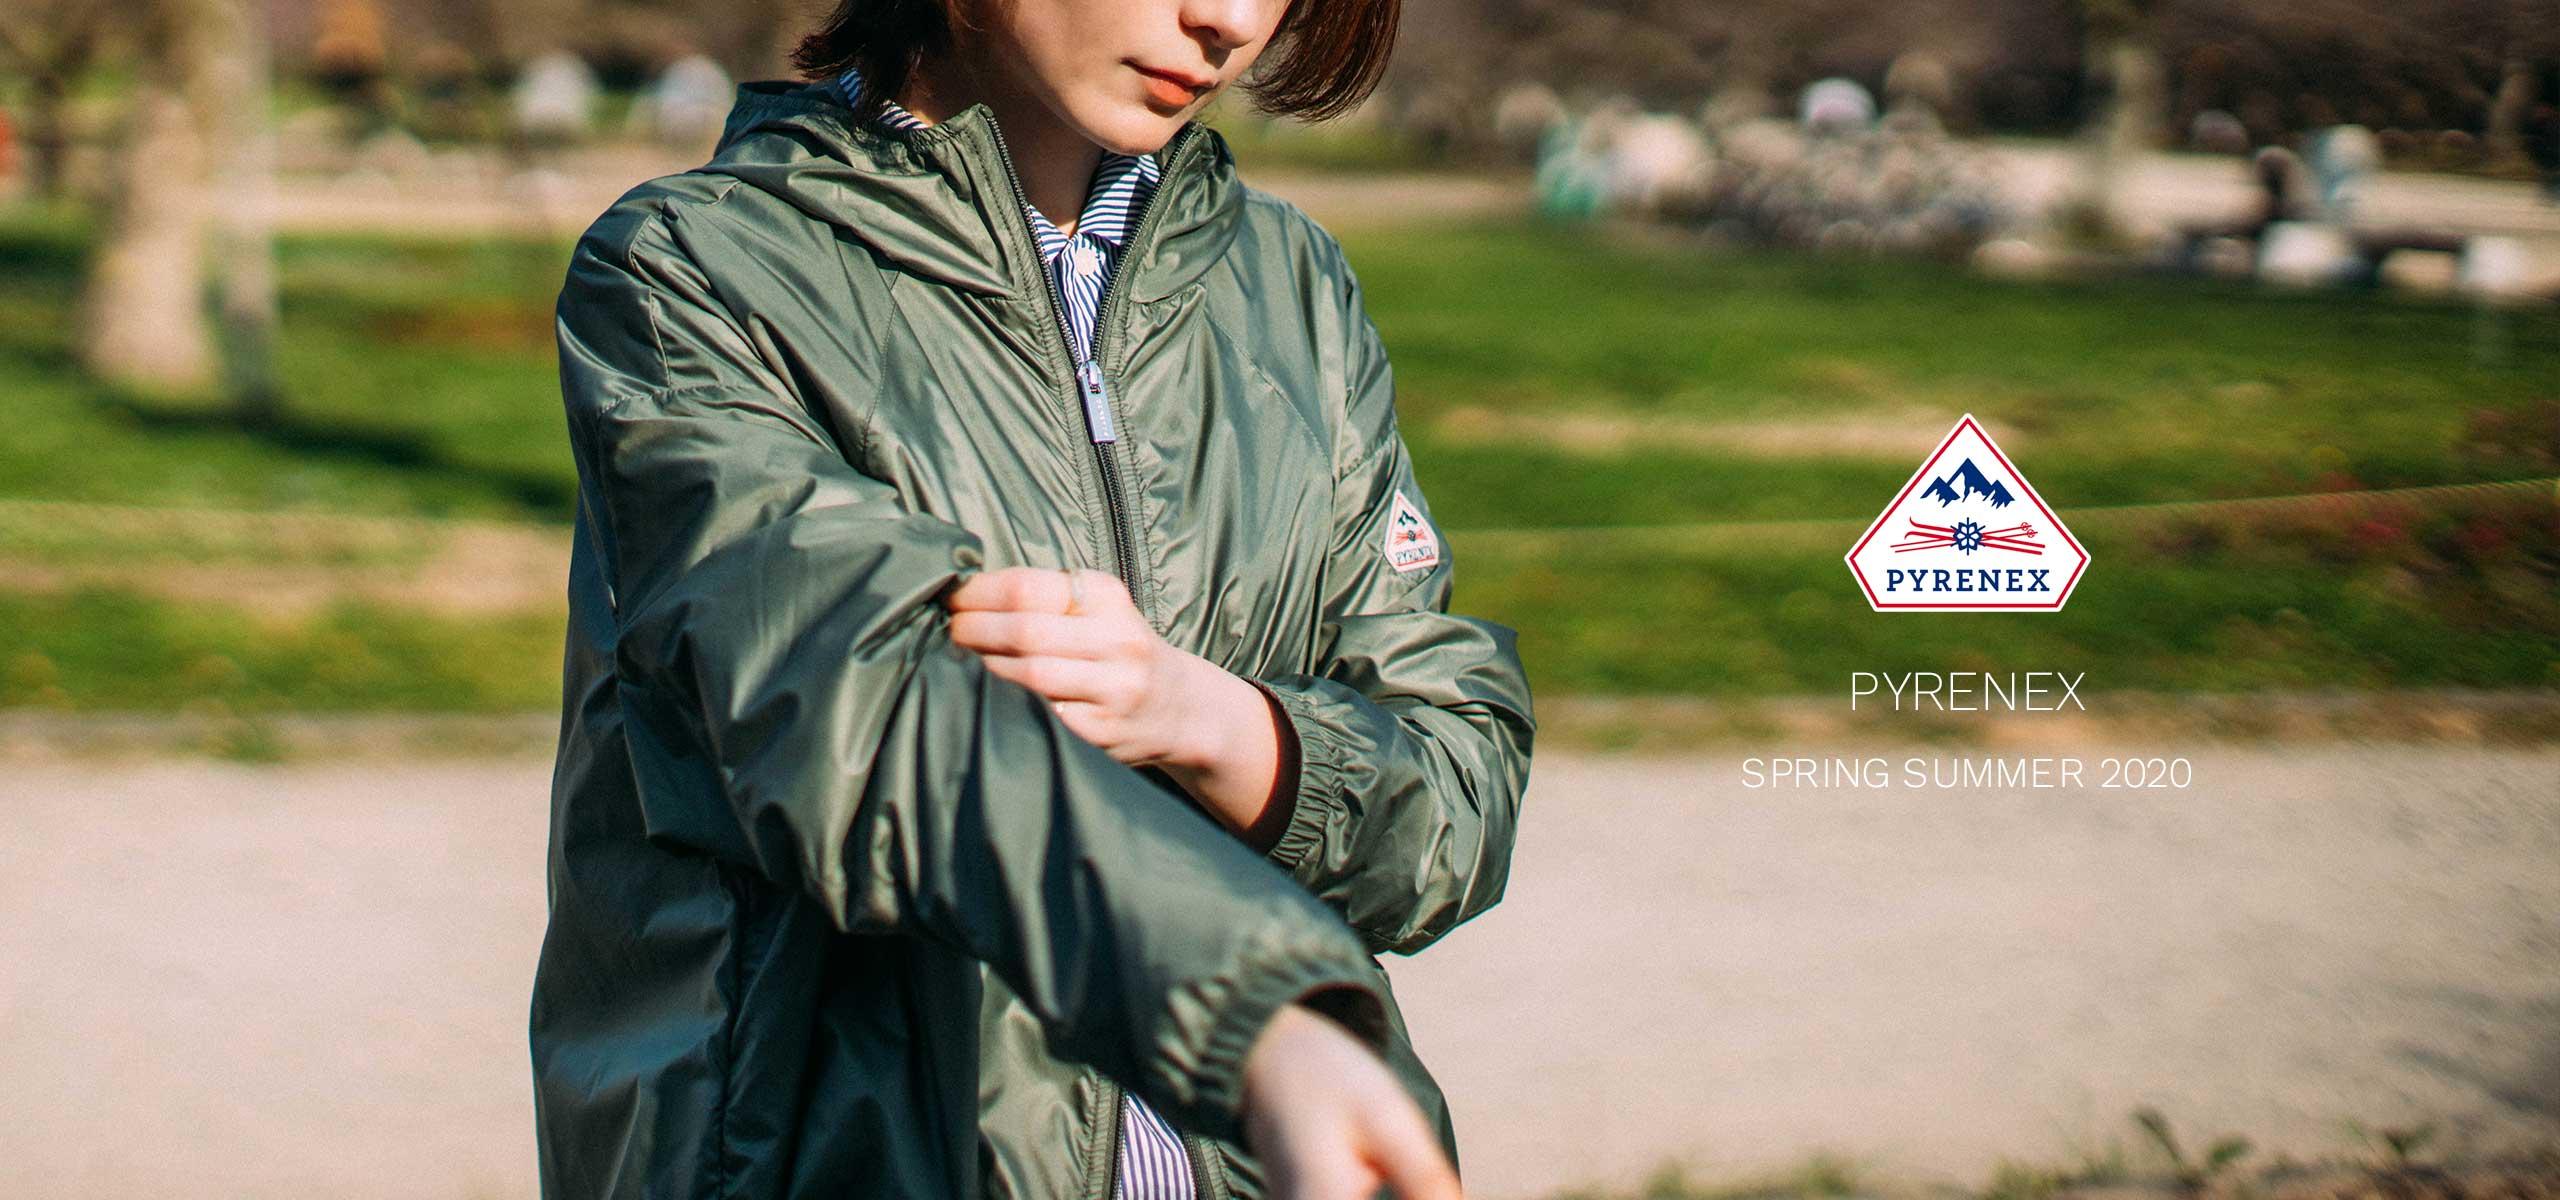 PYRENEX 2020 WOMEN'S SPRING/SUMMER